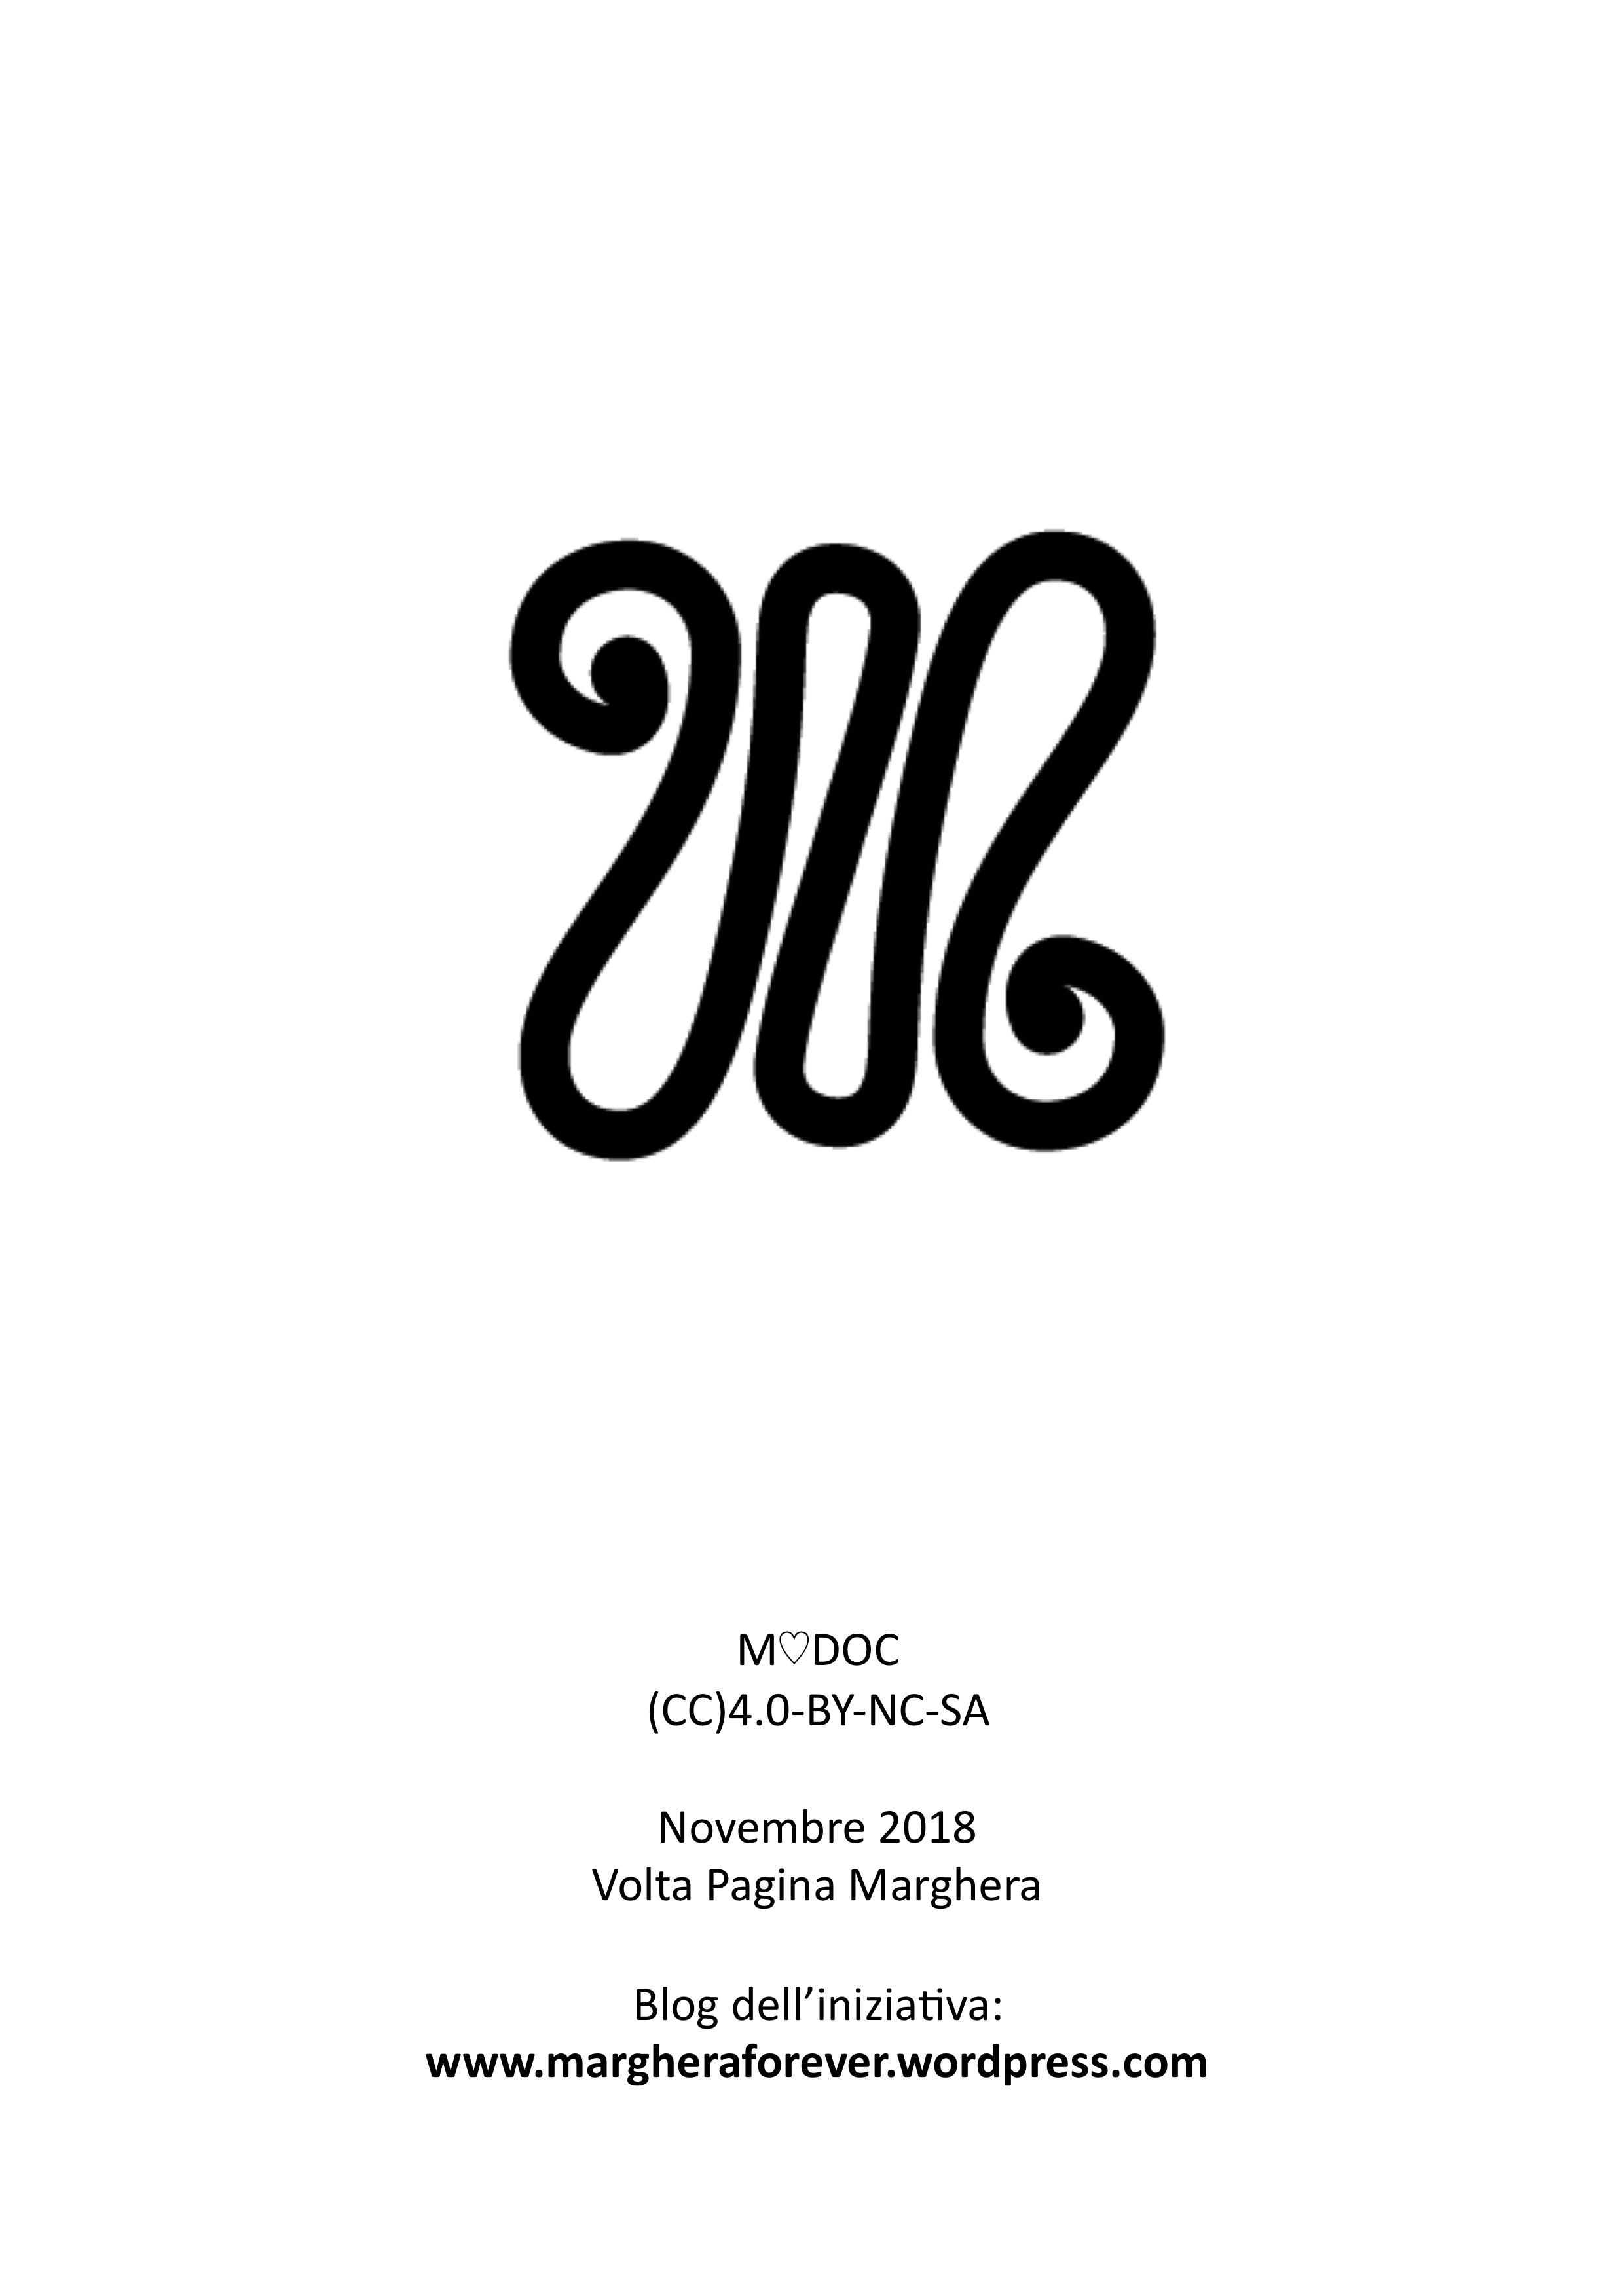 Diapositiva94 Marghera forever DOC - BOOK 2018